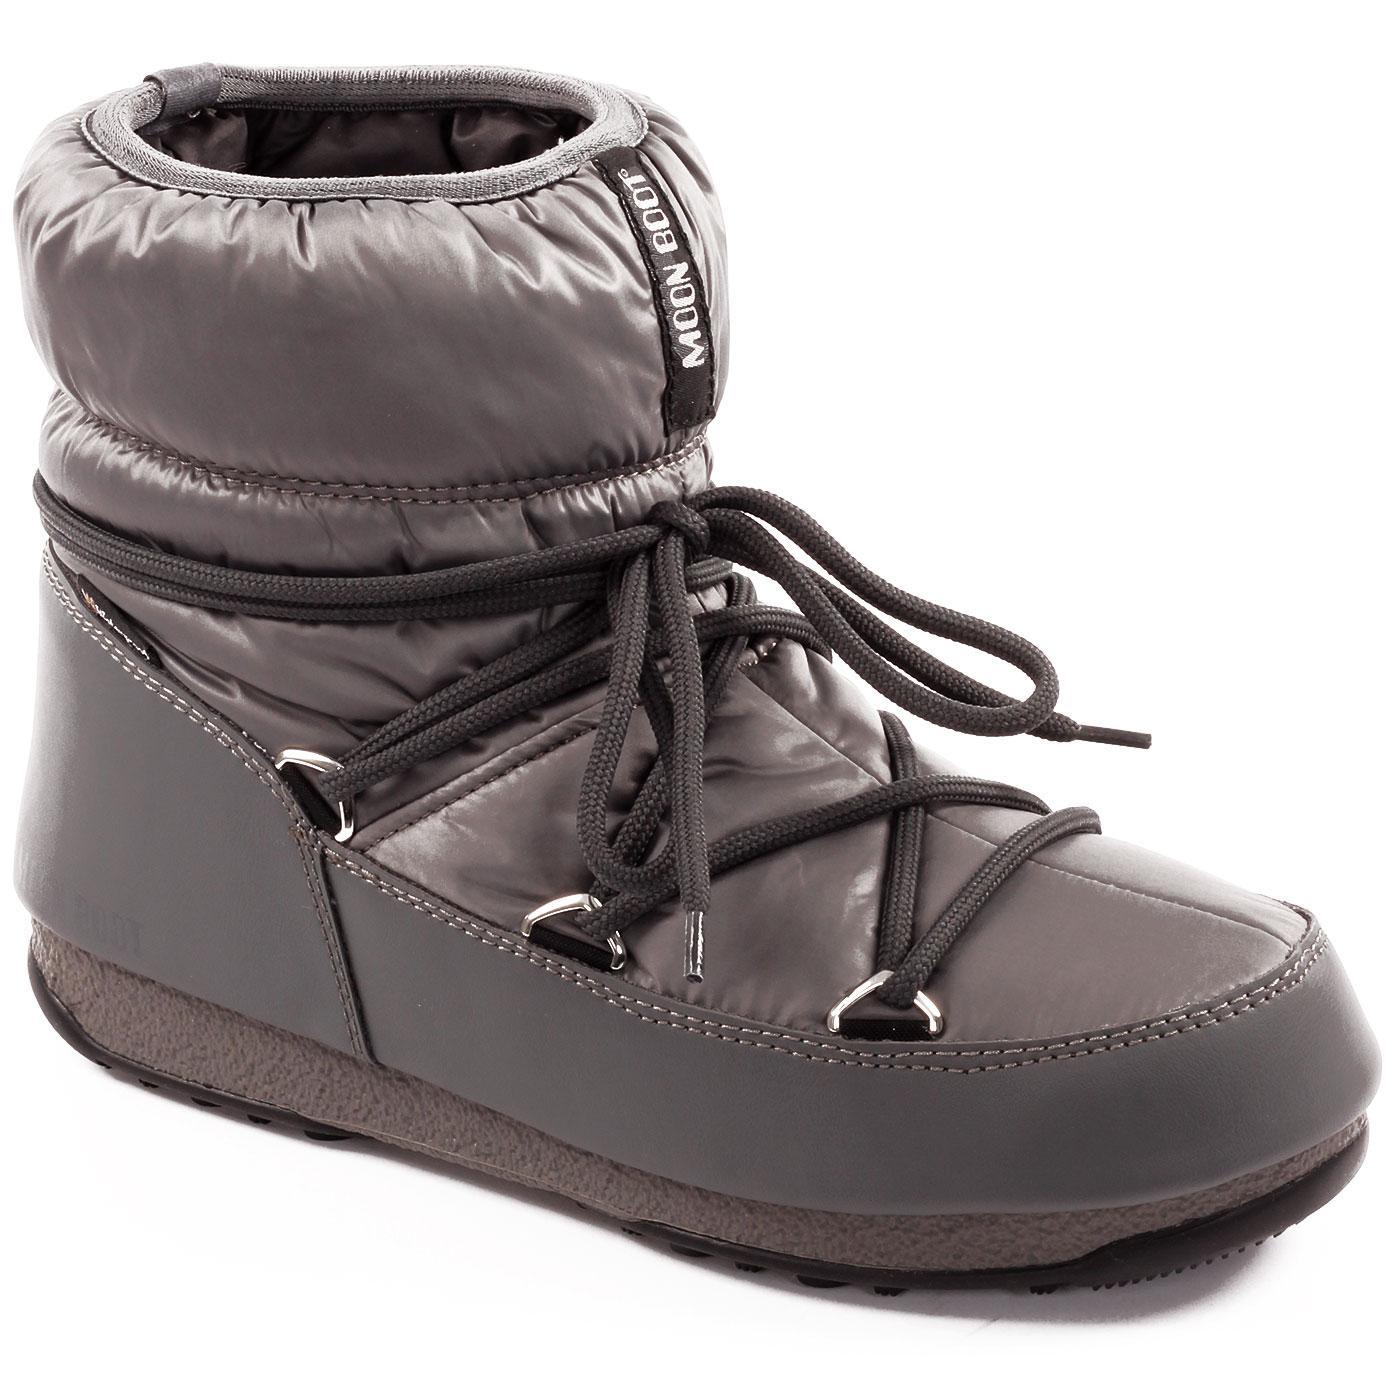 MOON BOOT Low Nylon WP Retro 70s Snow Boots CR